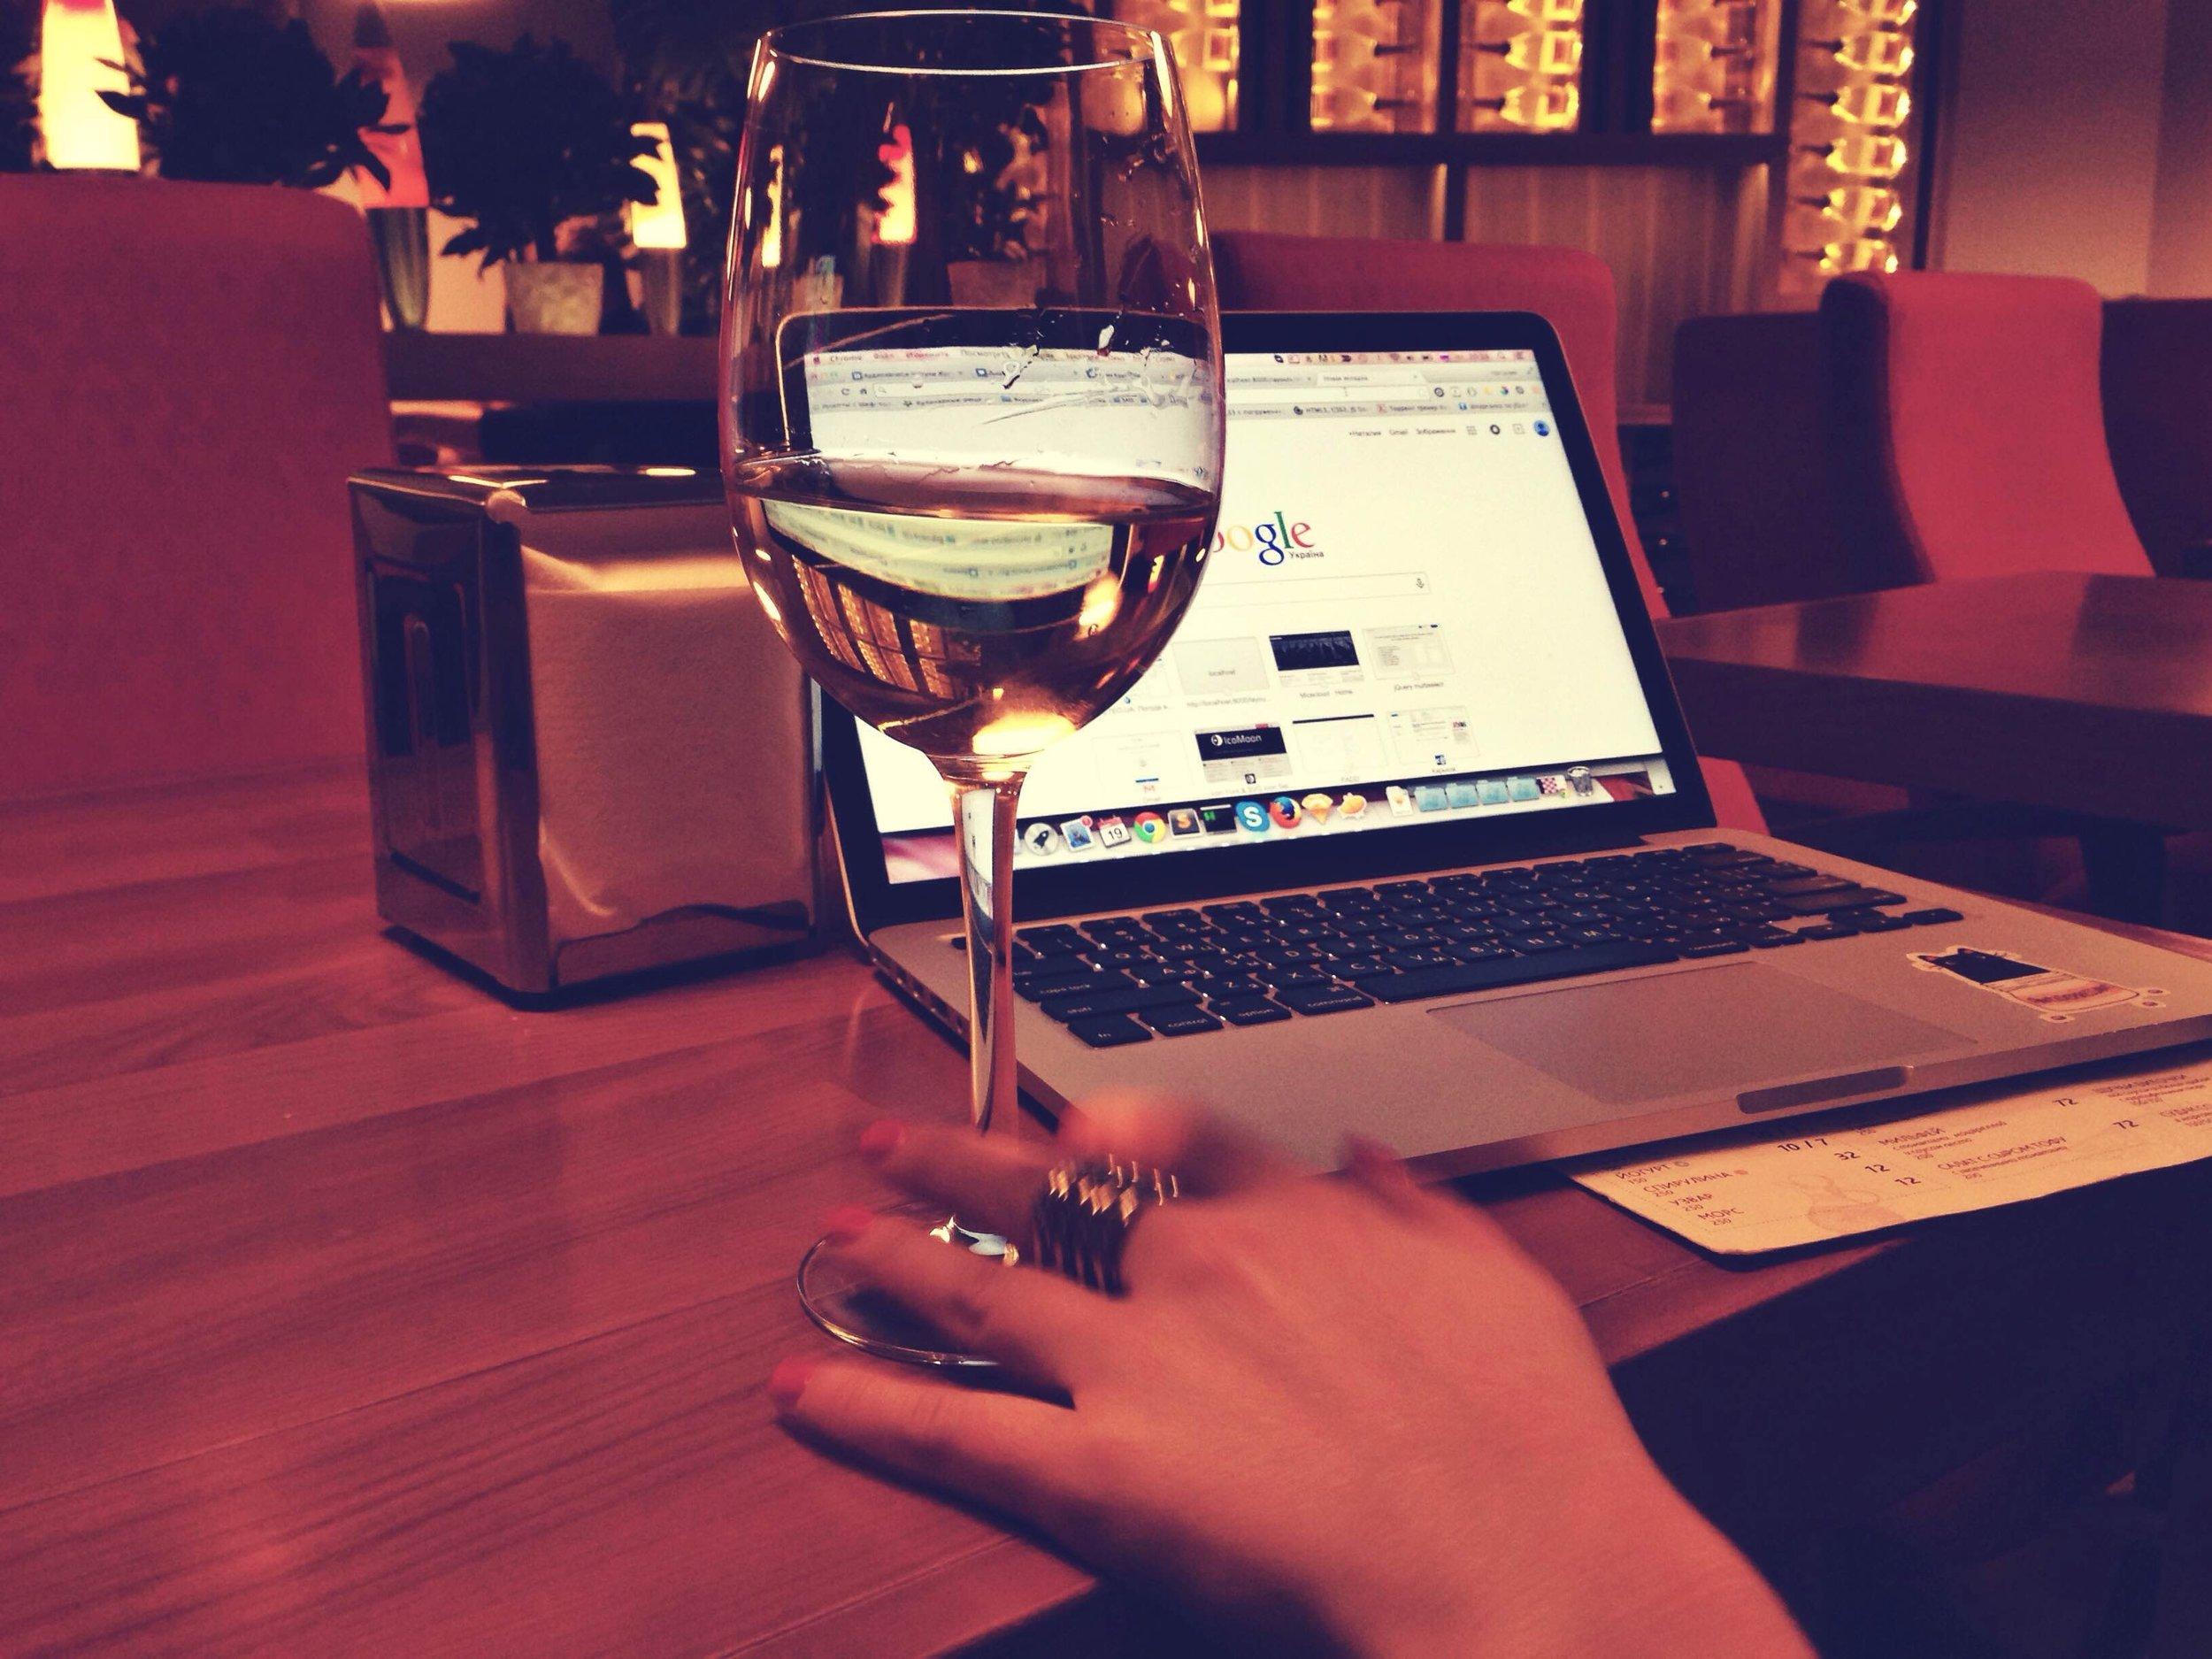 wine while working